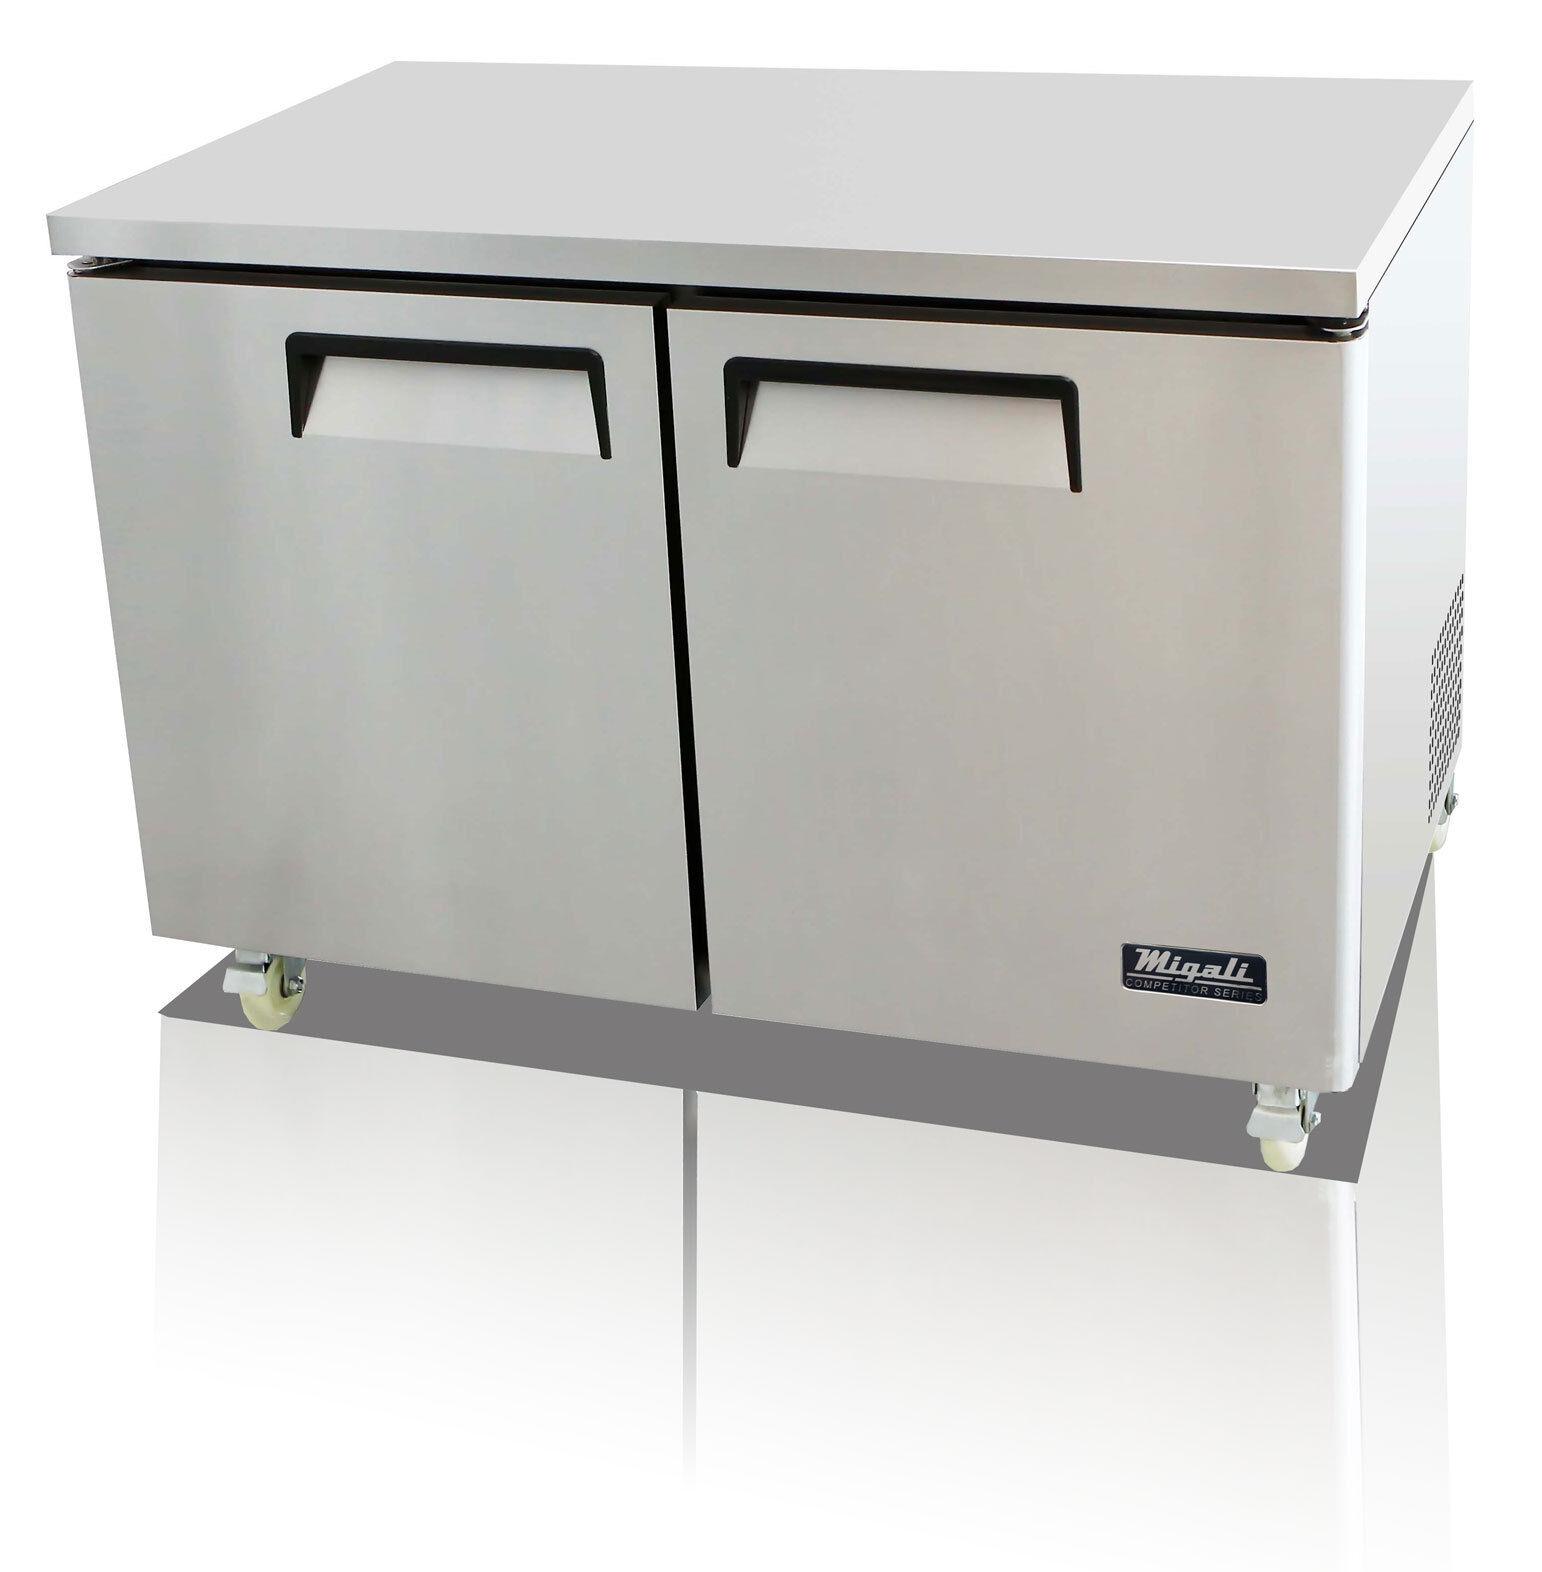 c u48r commercial two door undercounter refrigerator